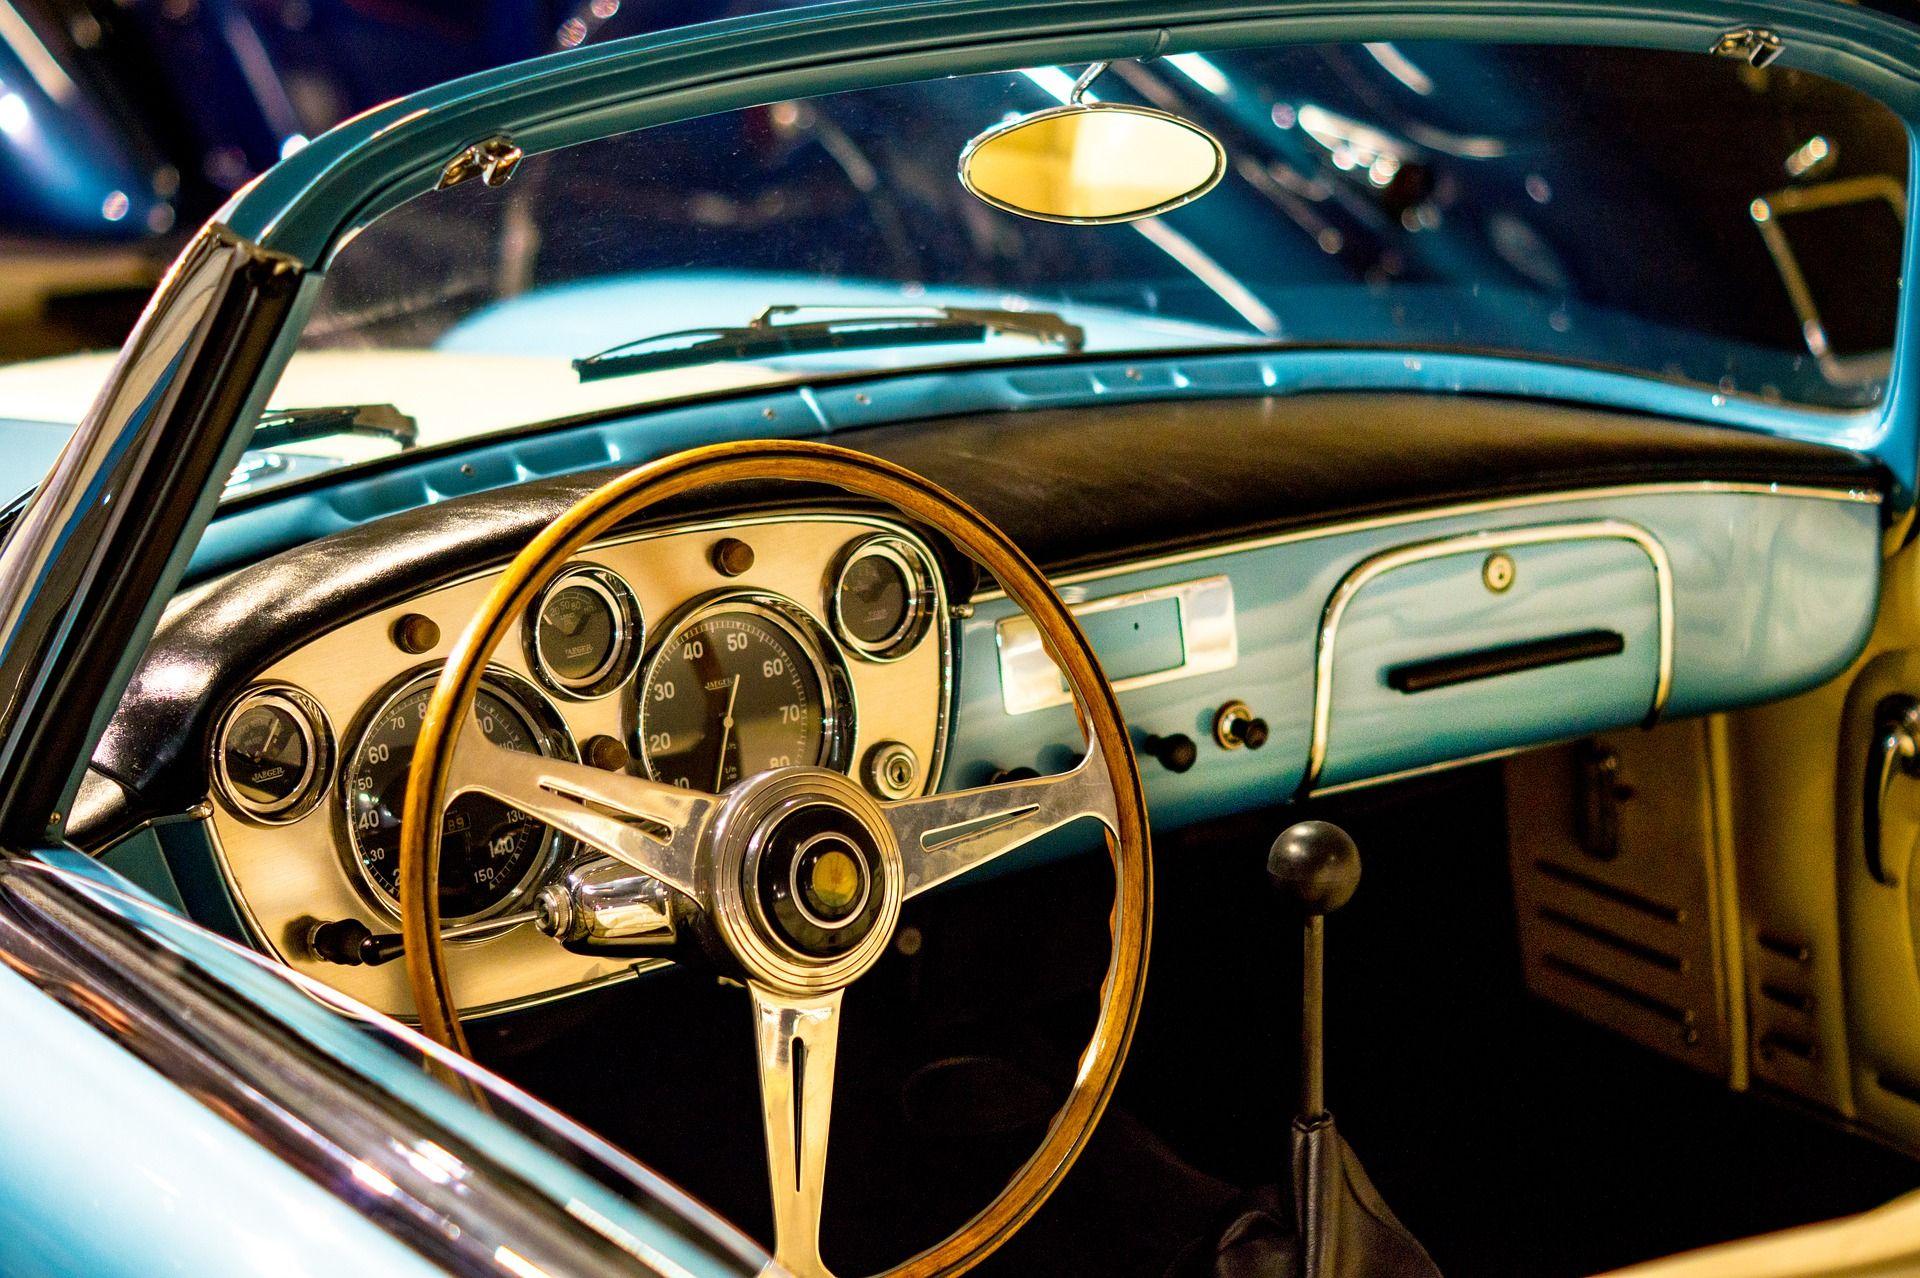 Old is gold. #cars #caraccessory #classiccars #vinatge #vintagecars ...